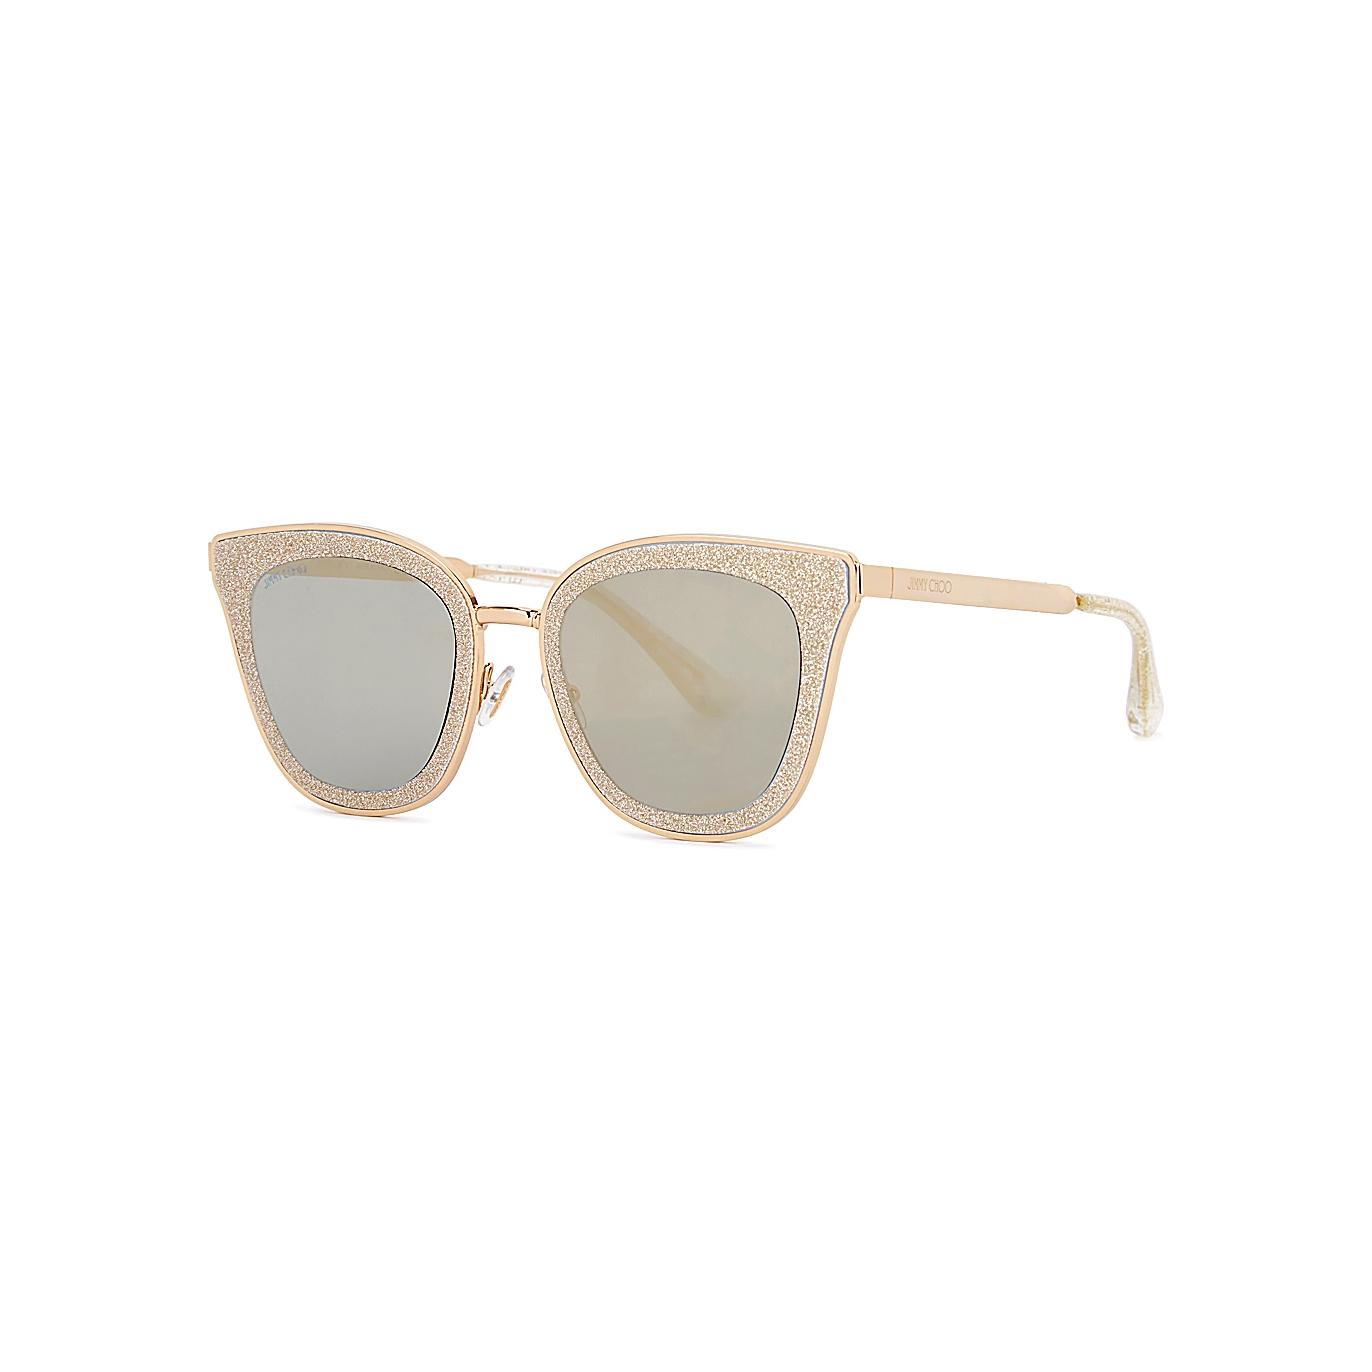 319b23b1d4 Jimmy Choo Lizzy glittered cat-eye sunglasses - Harvey Nichols